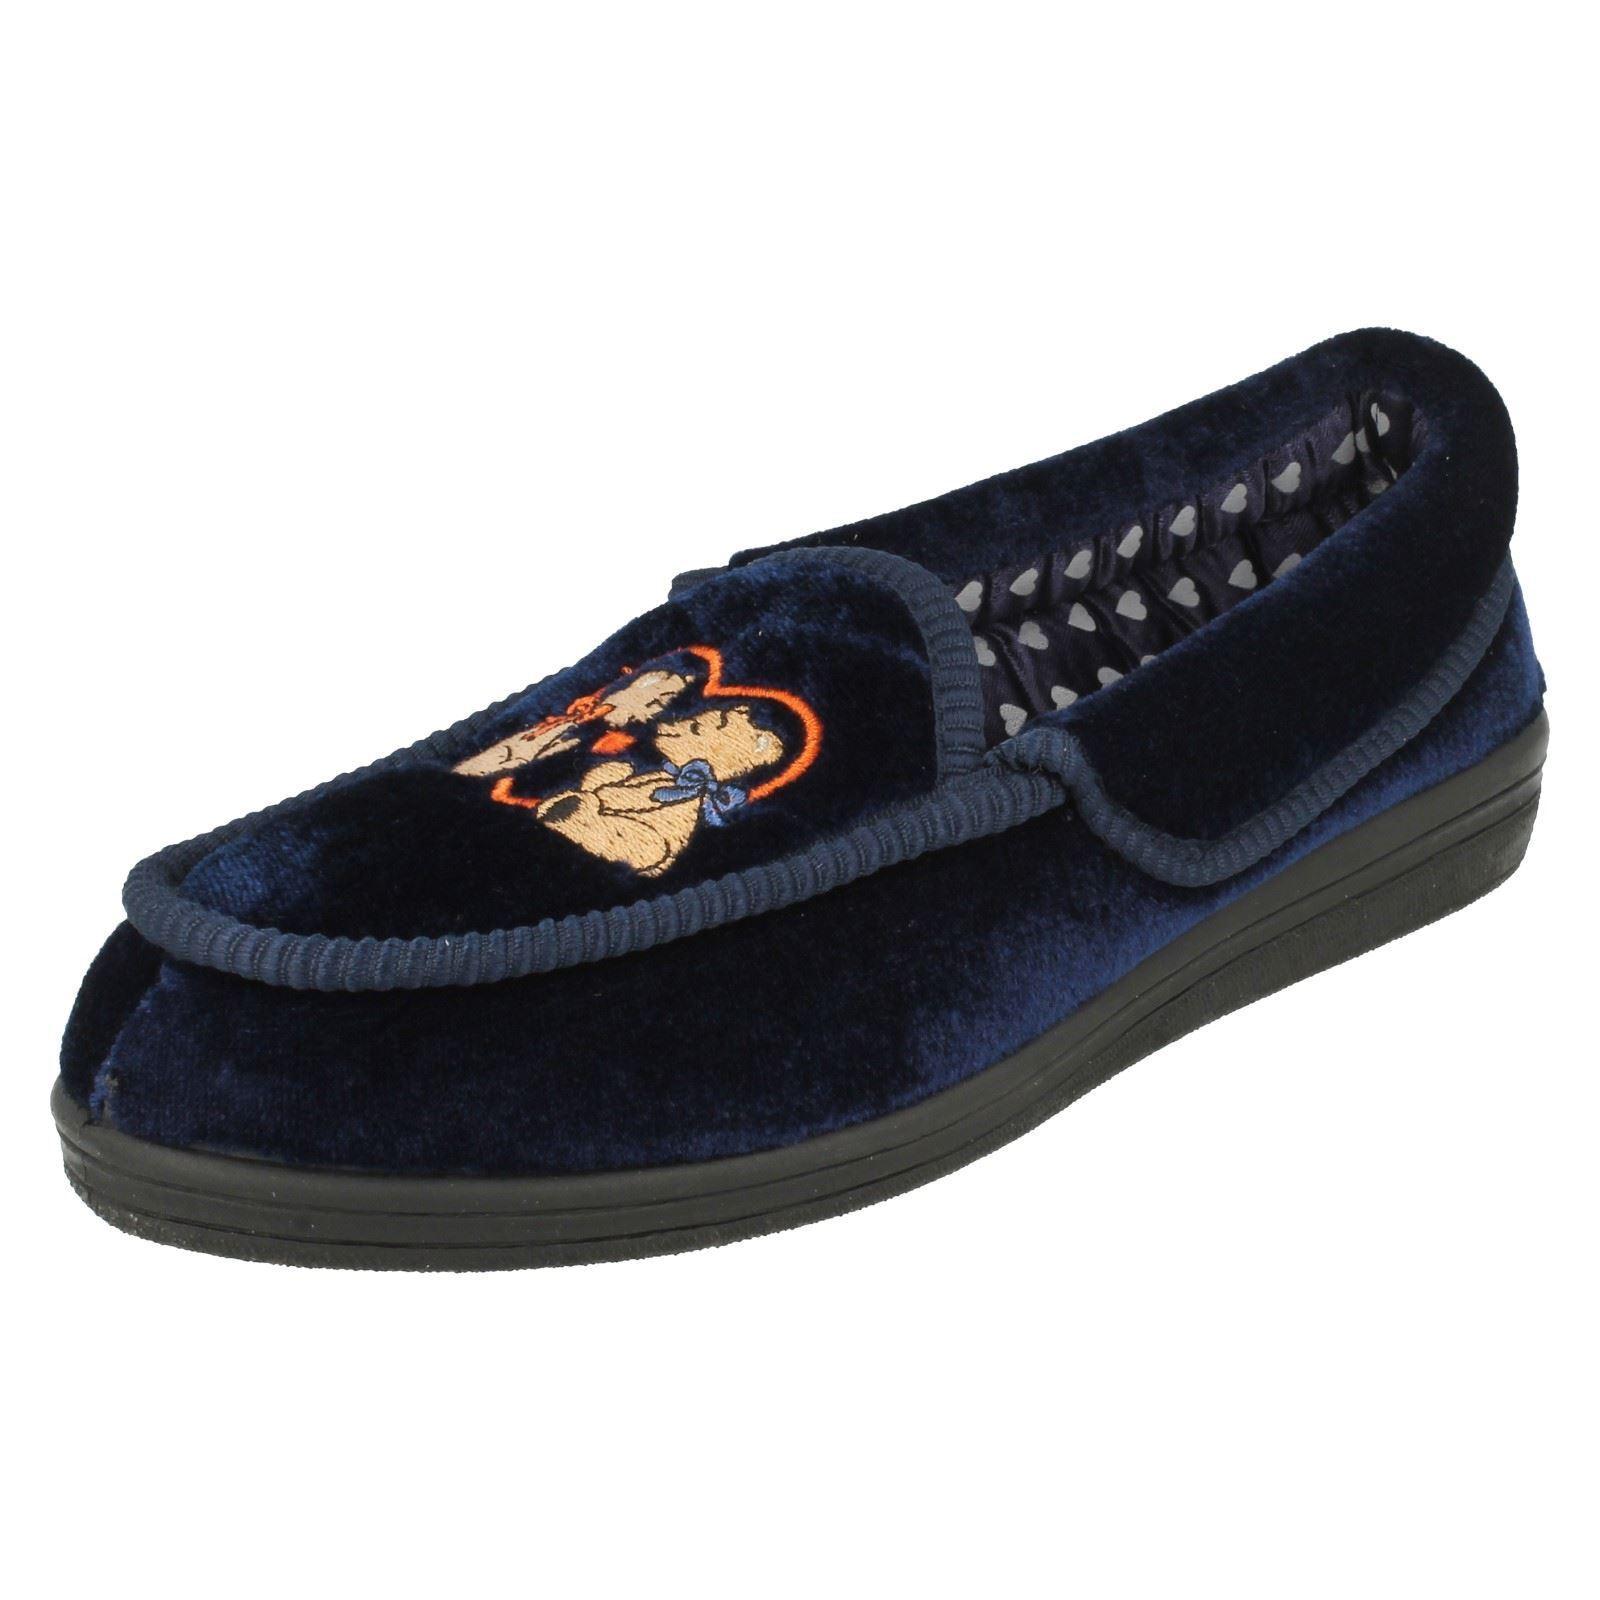 Donna QUATTRO motivo SEASON F325 Indoor flessibile SLIP ON motivo QUATTRO scarpe comodo intera b2b6f2